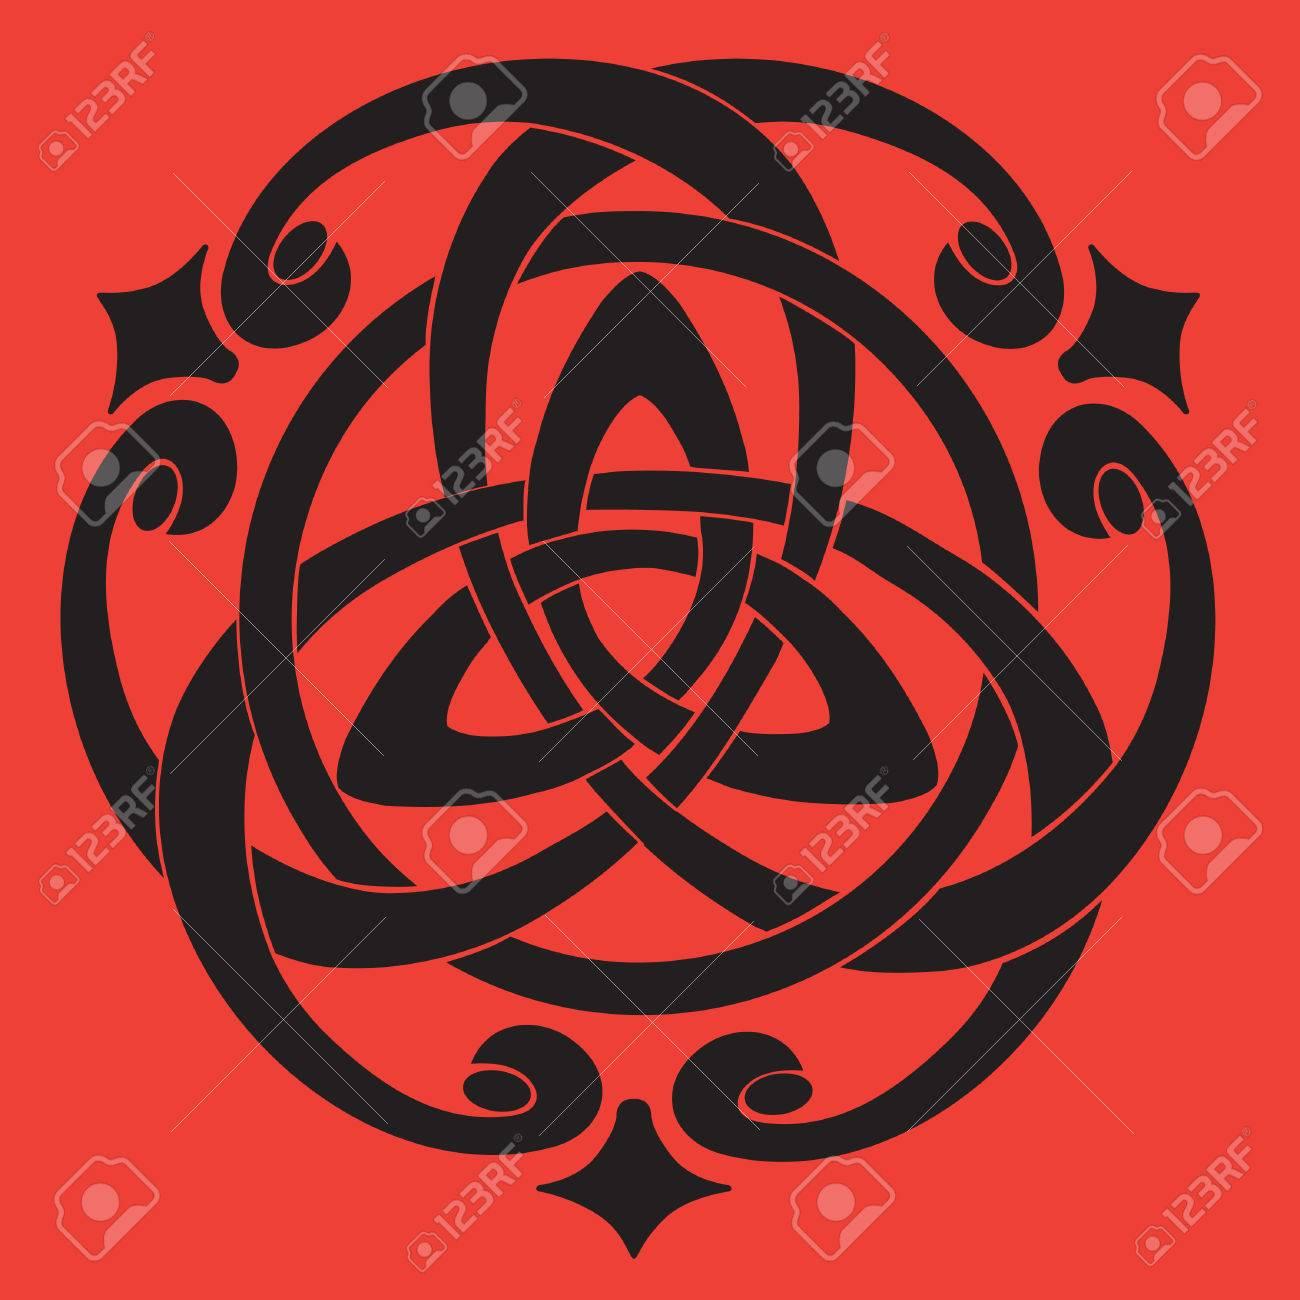 Vector Illustration of Celtic Knot Motif Stock Vector - 9036680